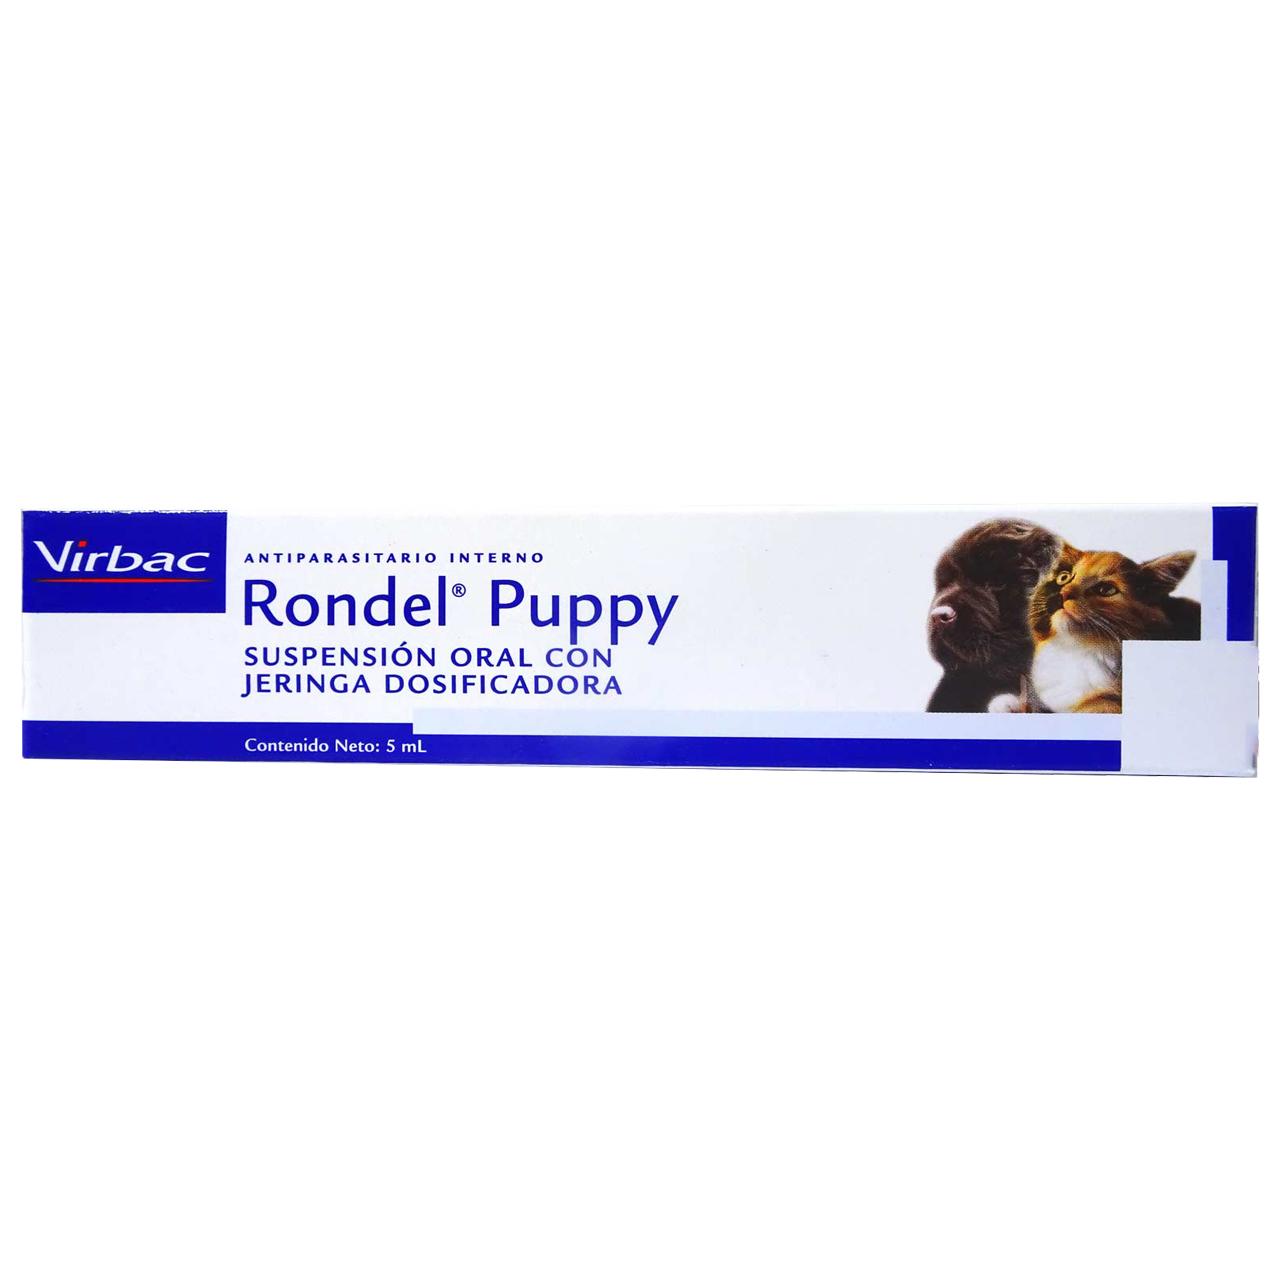 RondelPuppy5.jpg